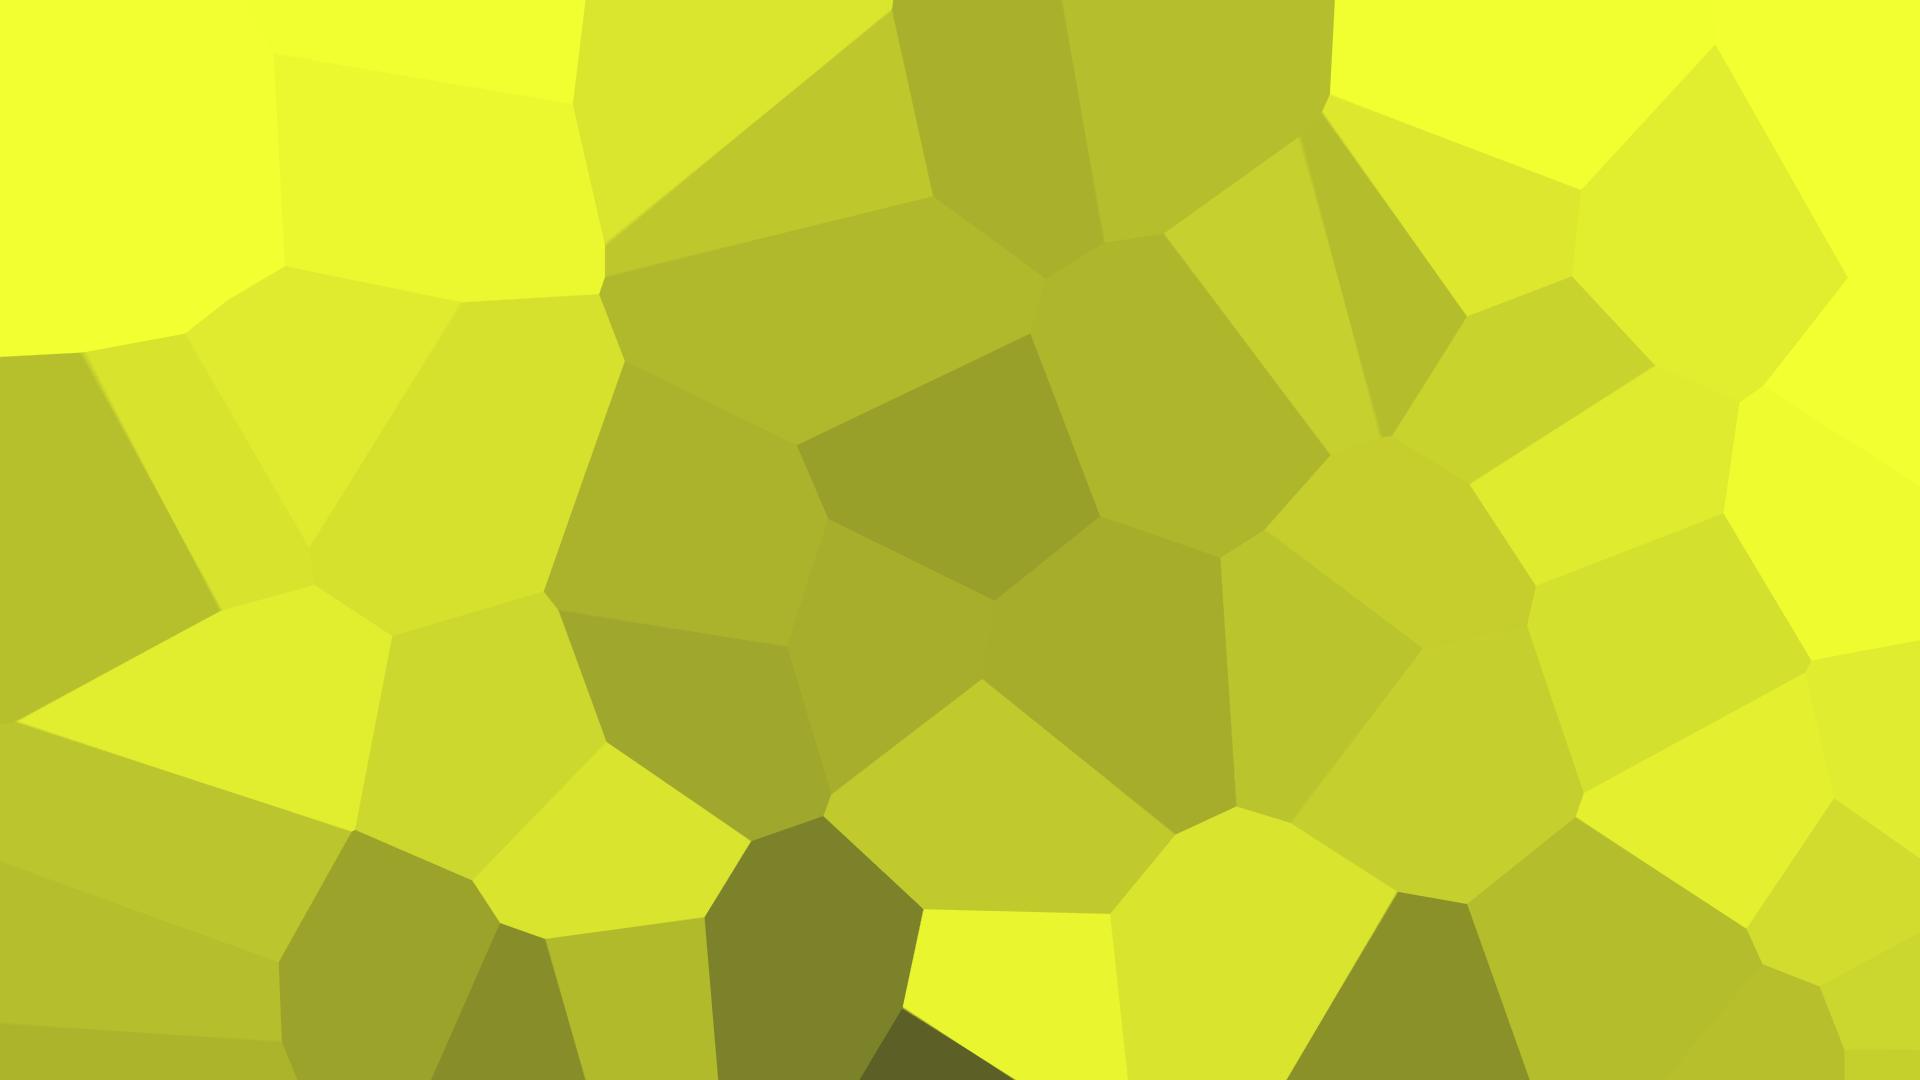 Irasi Minimalis Hijau Kuning Sederhana Pola Tekstur Kristal Lingkaran Terang Daun Bentuk Desain Garis Wallpaper Komputer